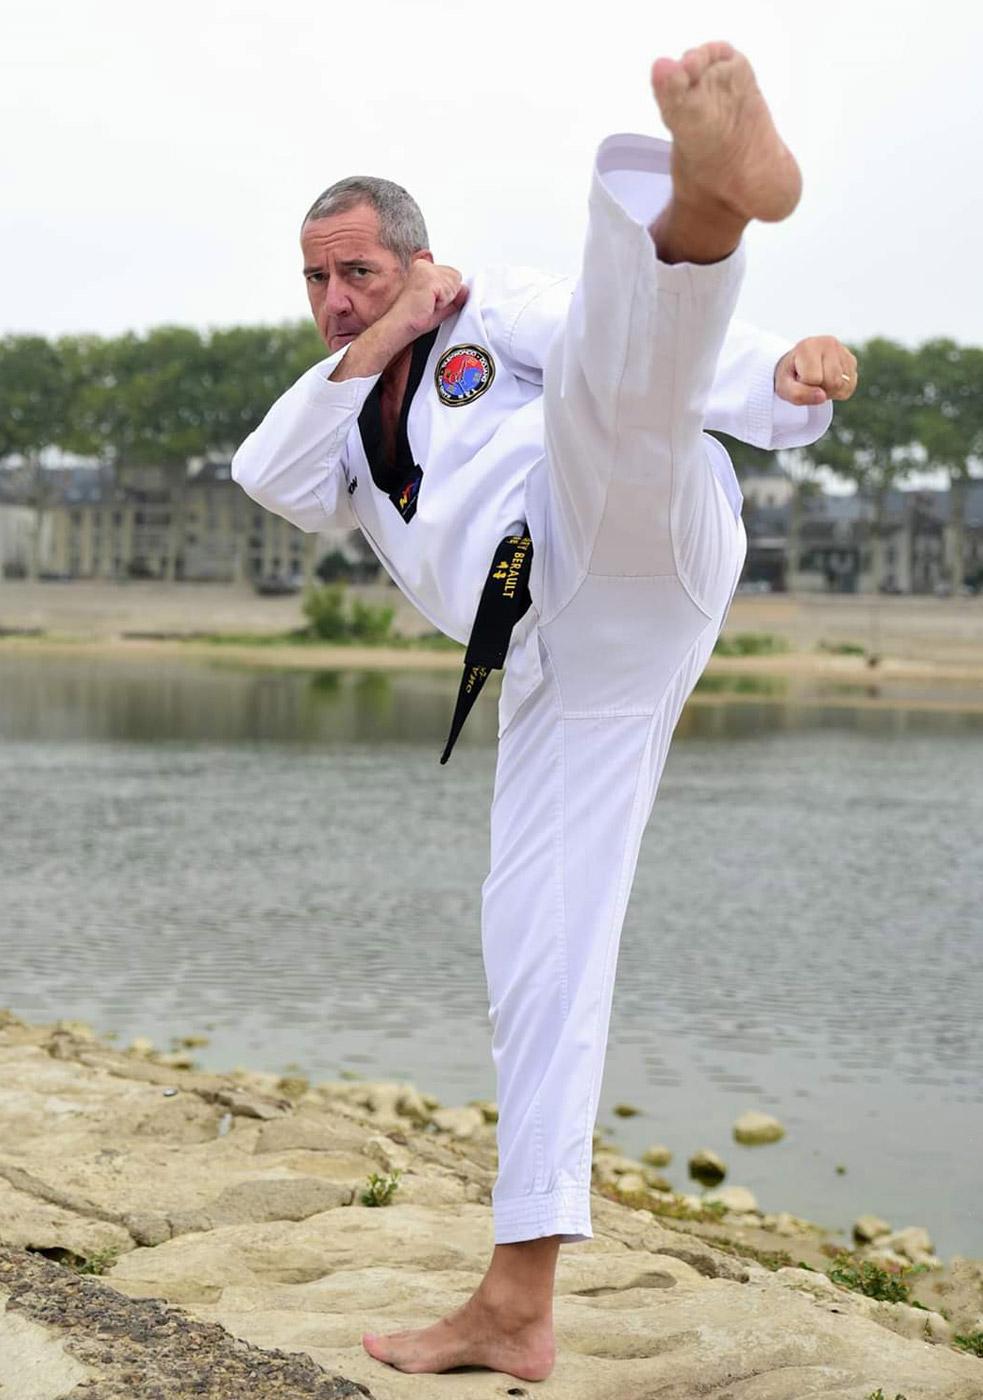 Kang-Ho ceinture noire Thierry Berault